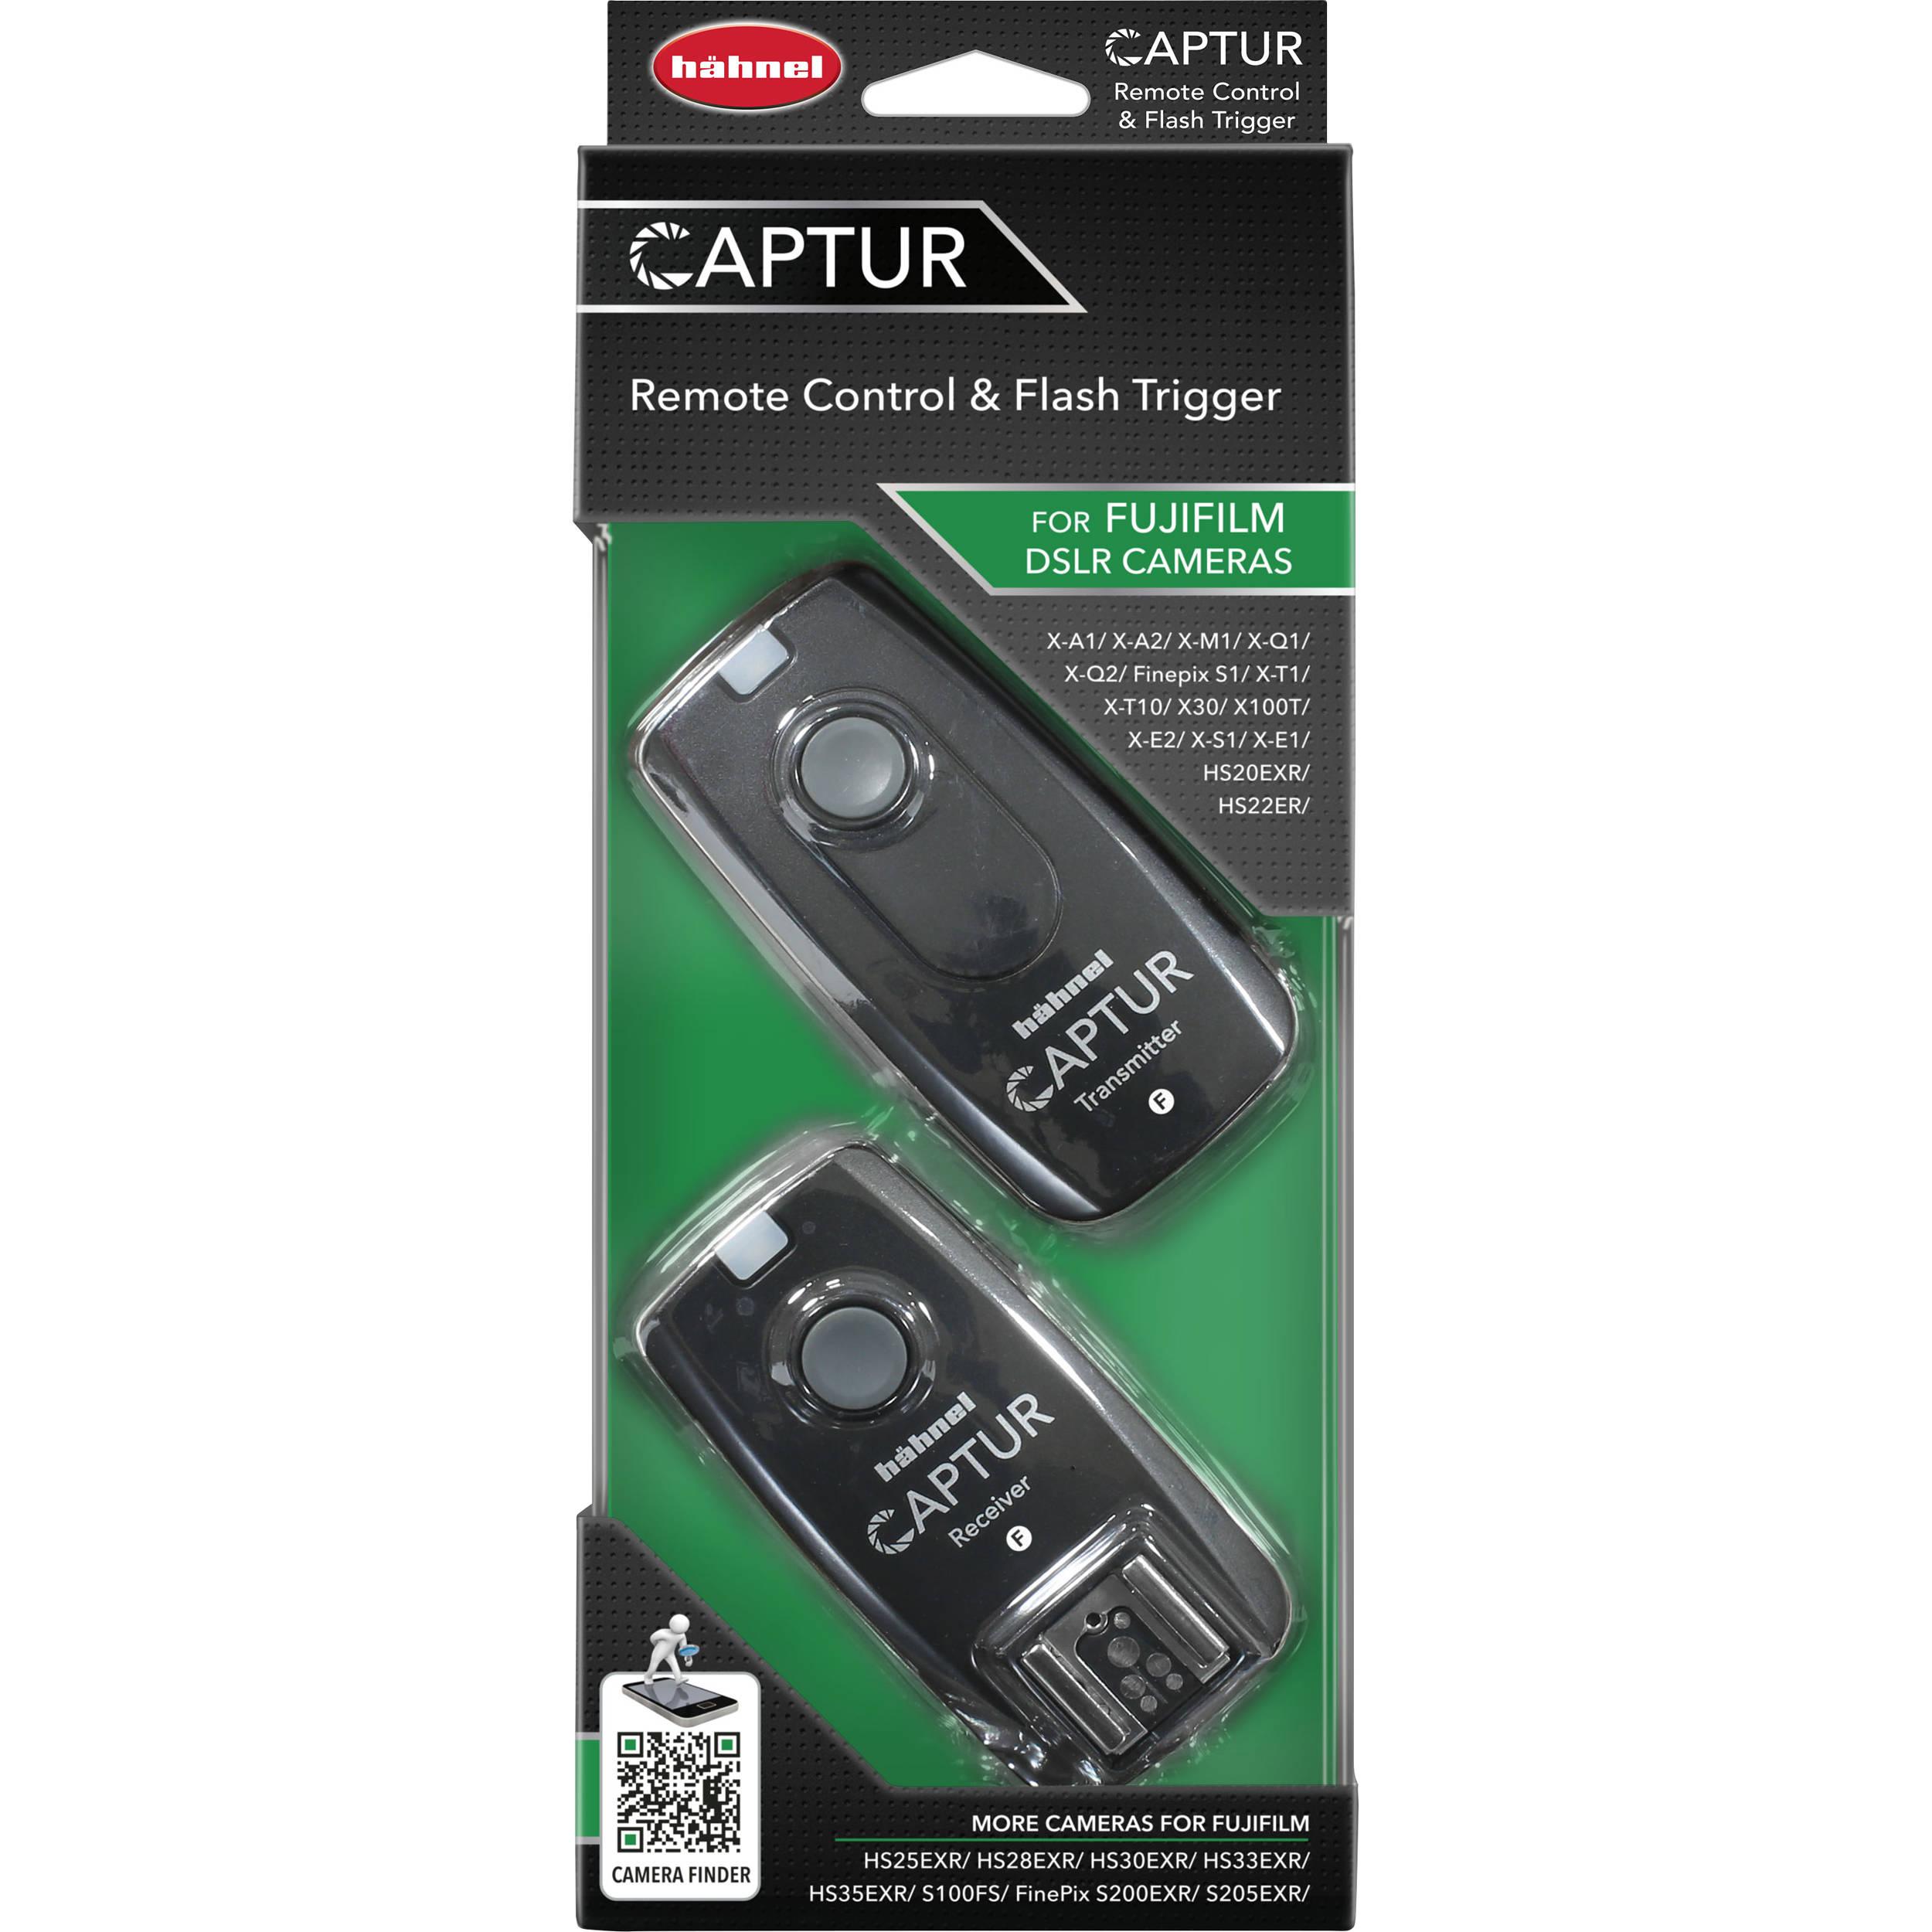 Hahnel Captur Remote Control And Flash Trigger Hl F Bh Blb M2 M3 Printed Circuit Board Pc Boards Shop For Fujifilm Cameras